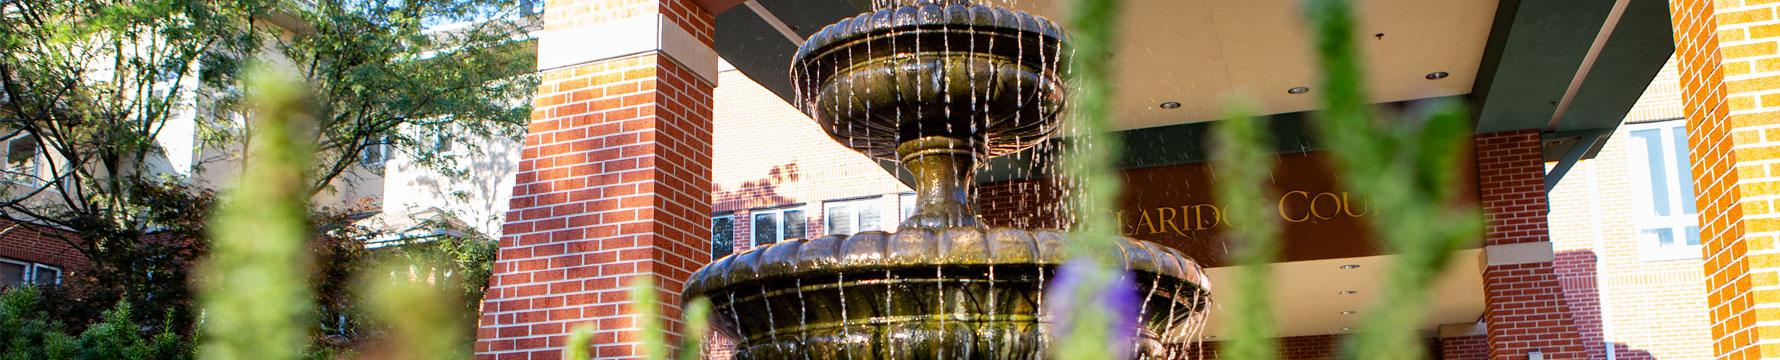 The fountain at the front entrance of Claridge Court senior living community in Prairie Village Kansas